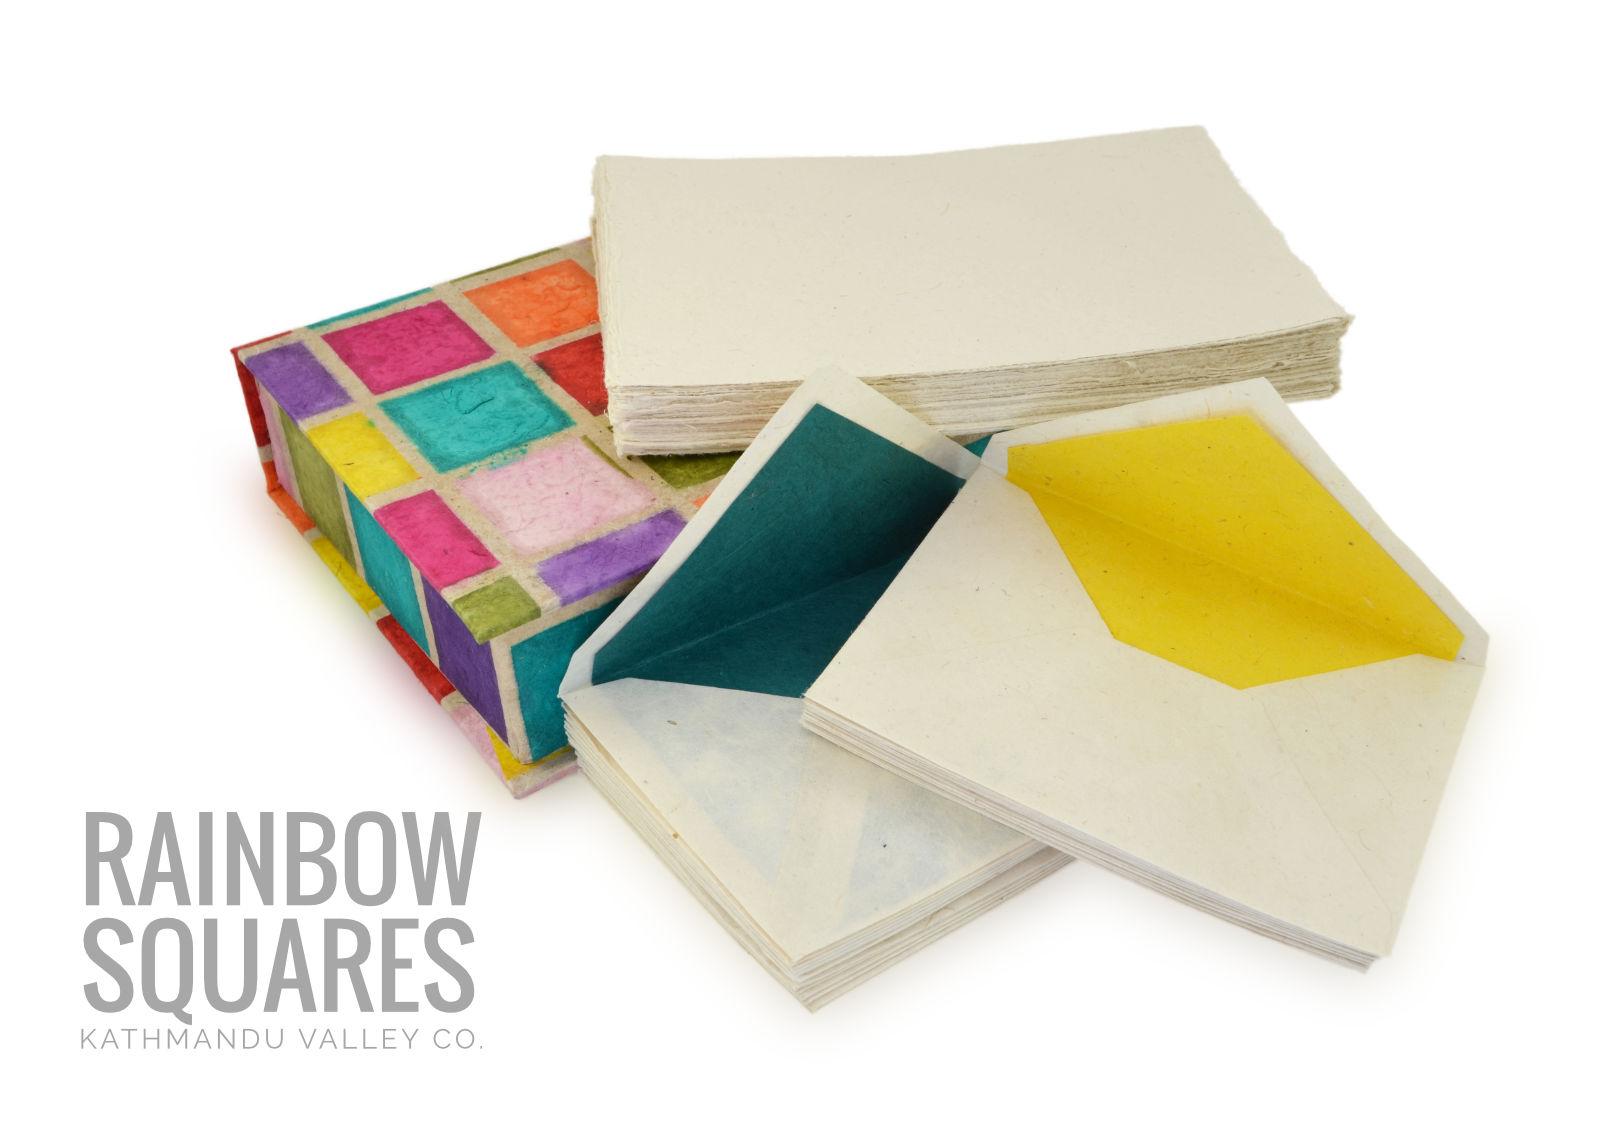 Kathmandu Valley Co. Stationery Gift Box Set Rainbow Squares